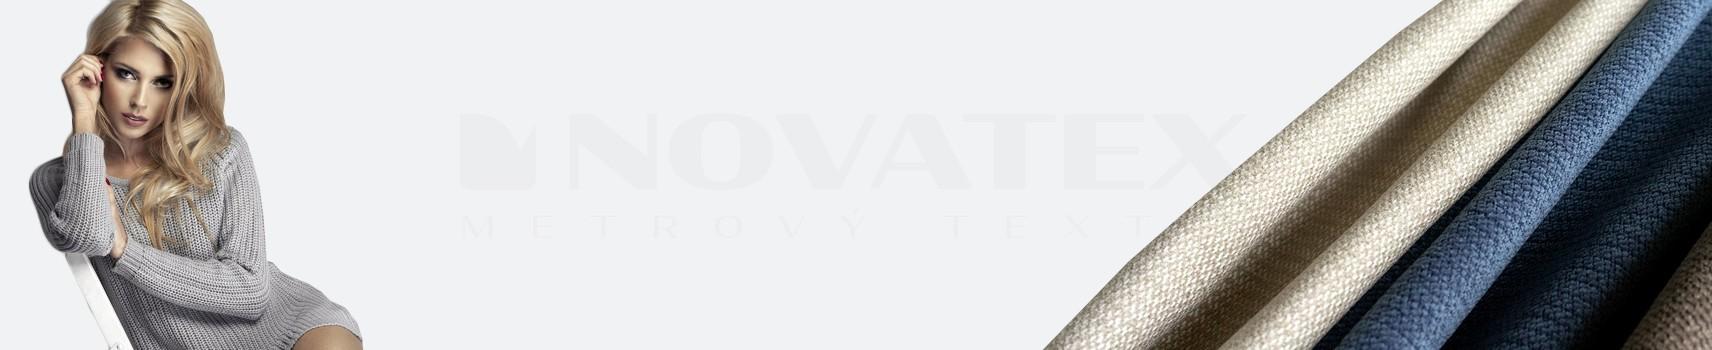 NOVATEX Metrový textil - Svetrovina - jednolíc,oboulíc,microfleec - hřejivá látka